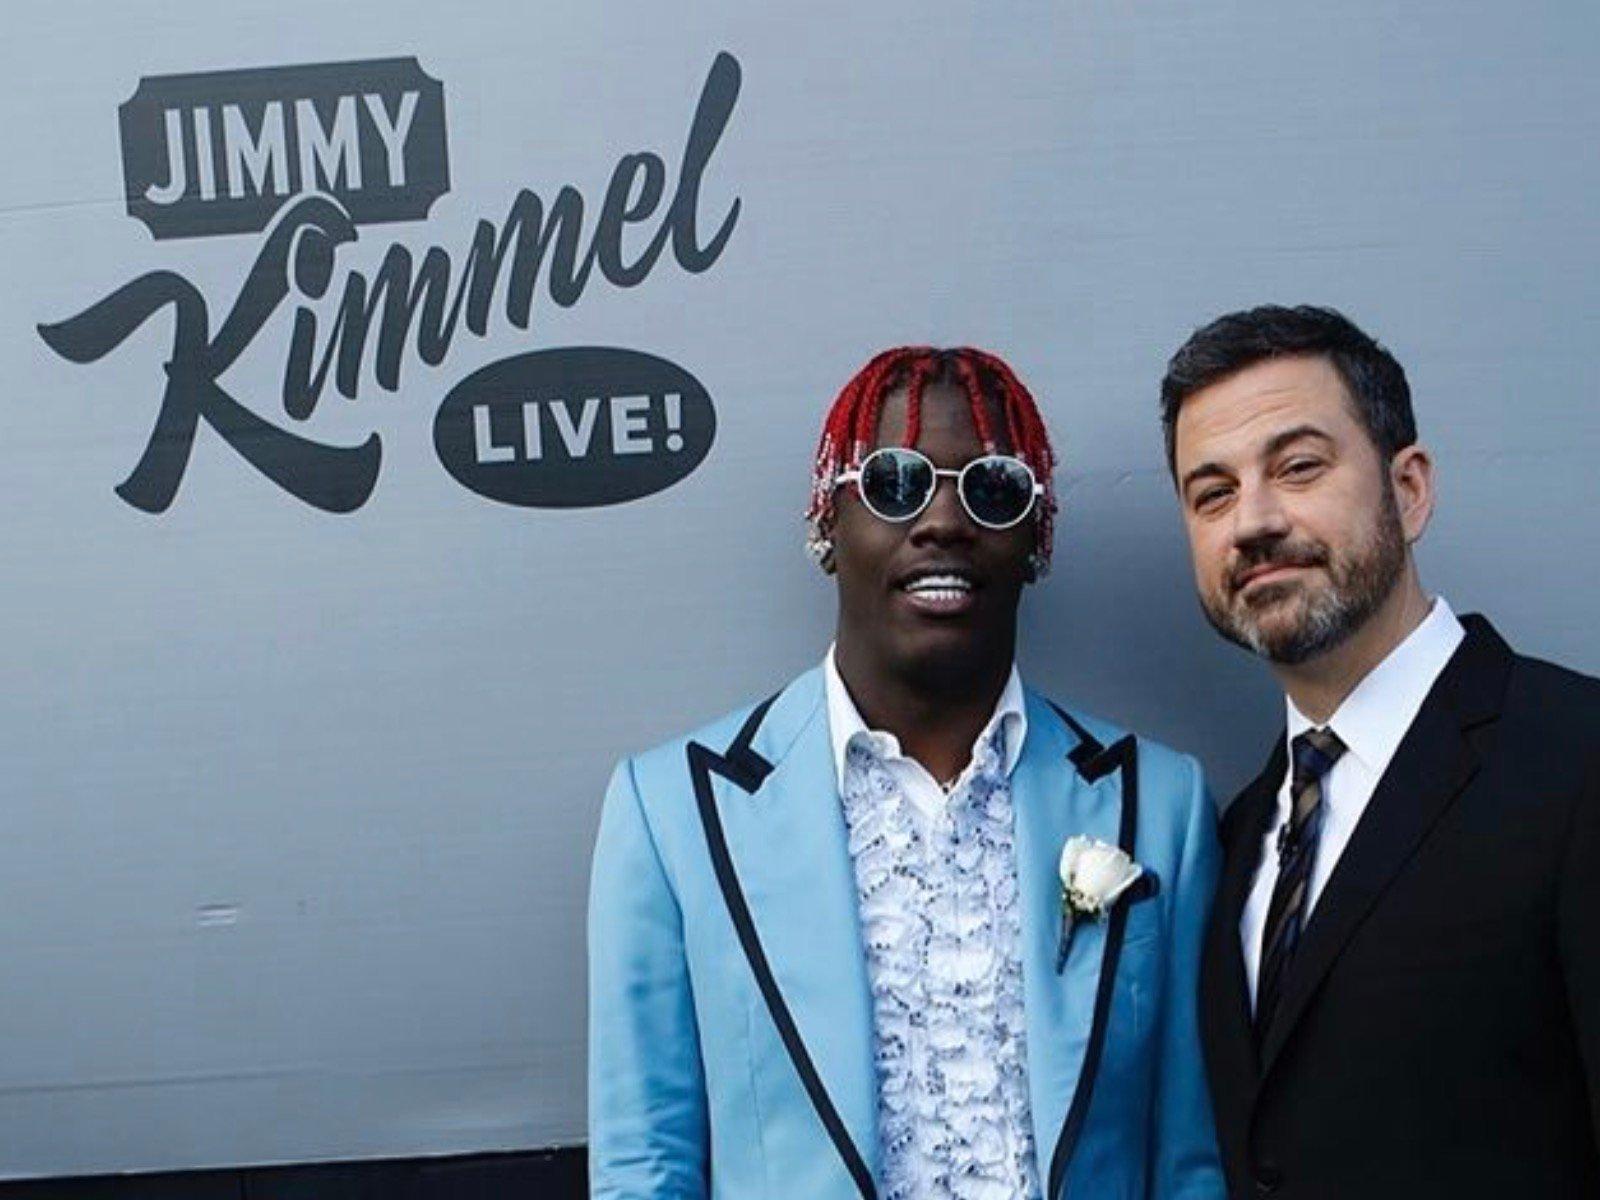 Lil Yachty Jimmy Kimmel